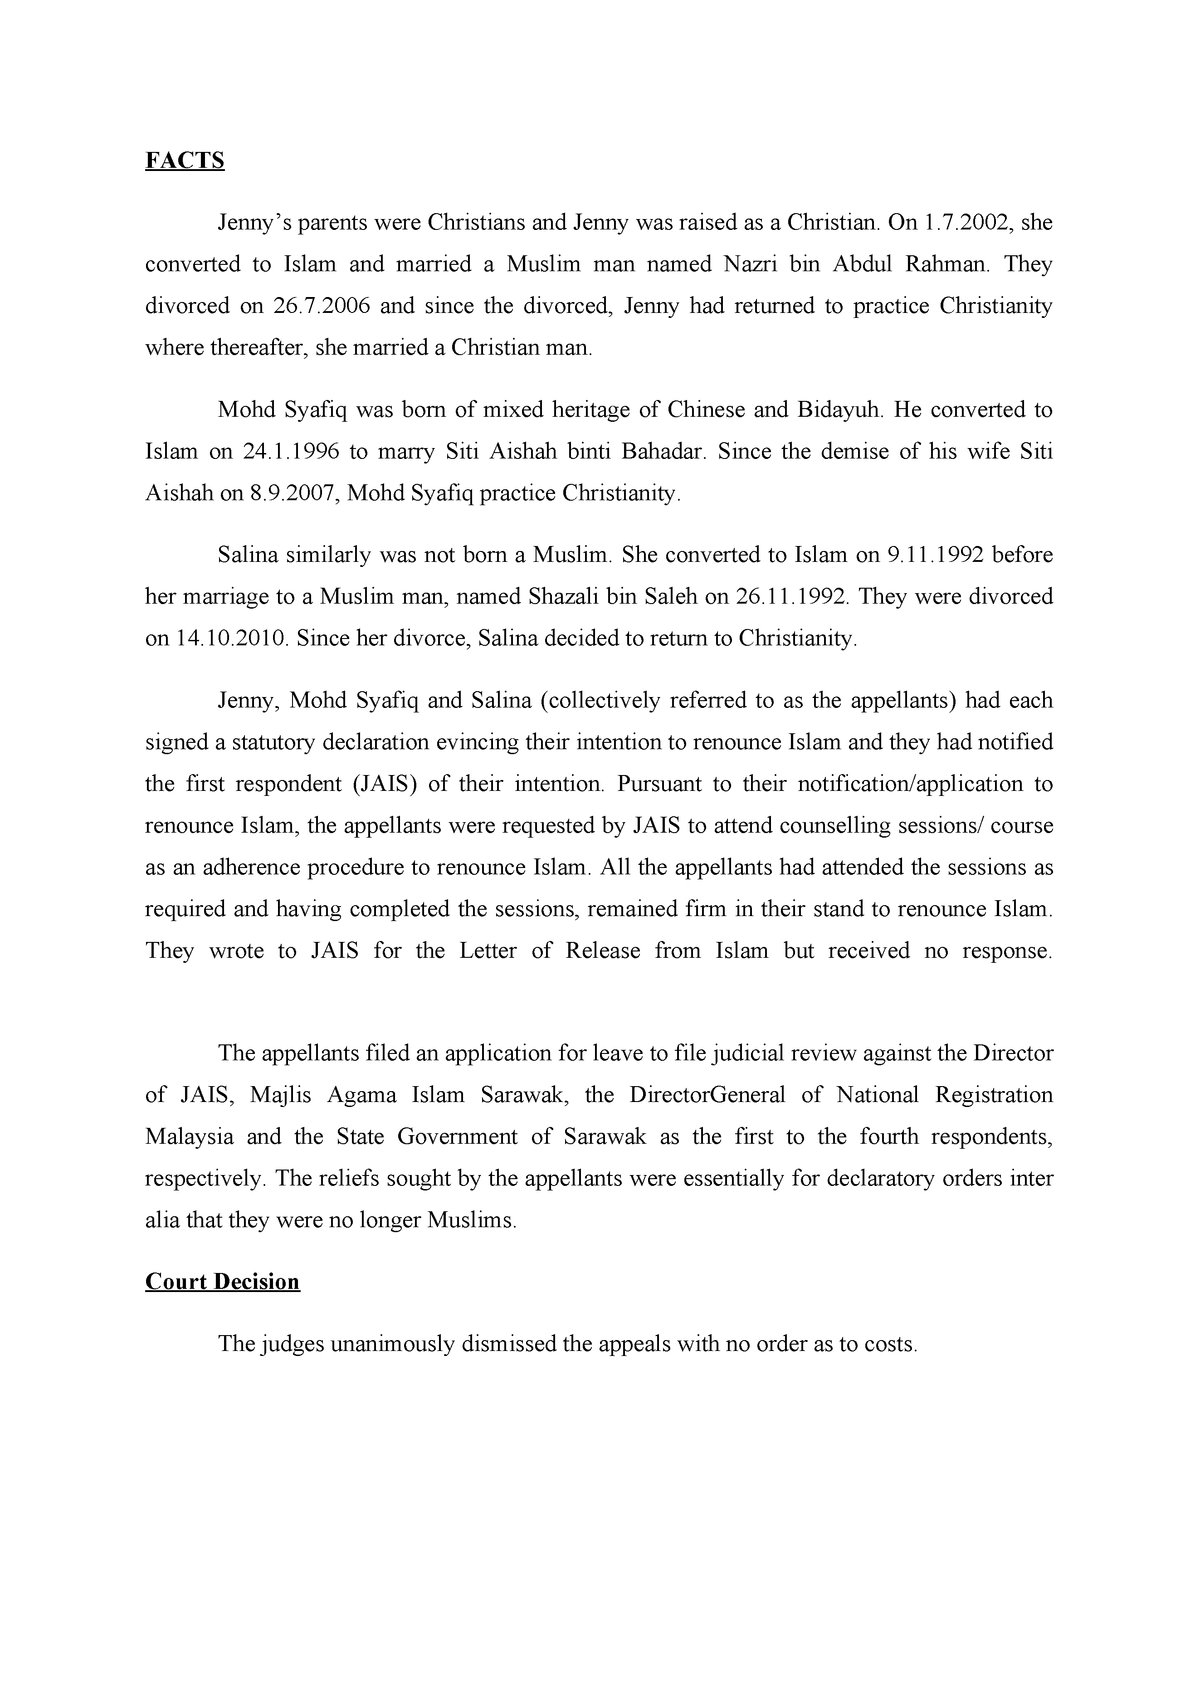 Jenny Peter CASE Summary - Law LAW224 - UiTM - StuDocu